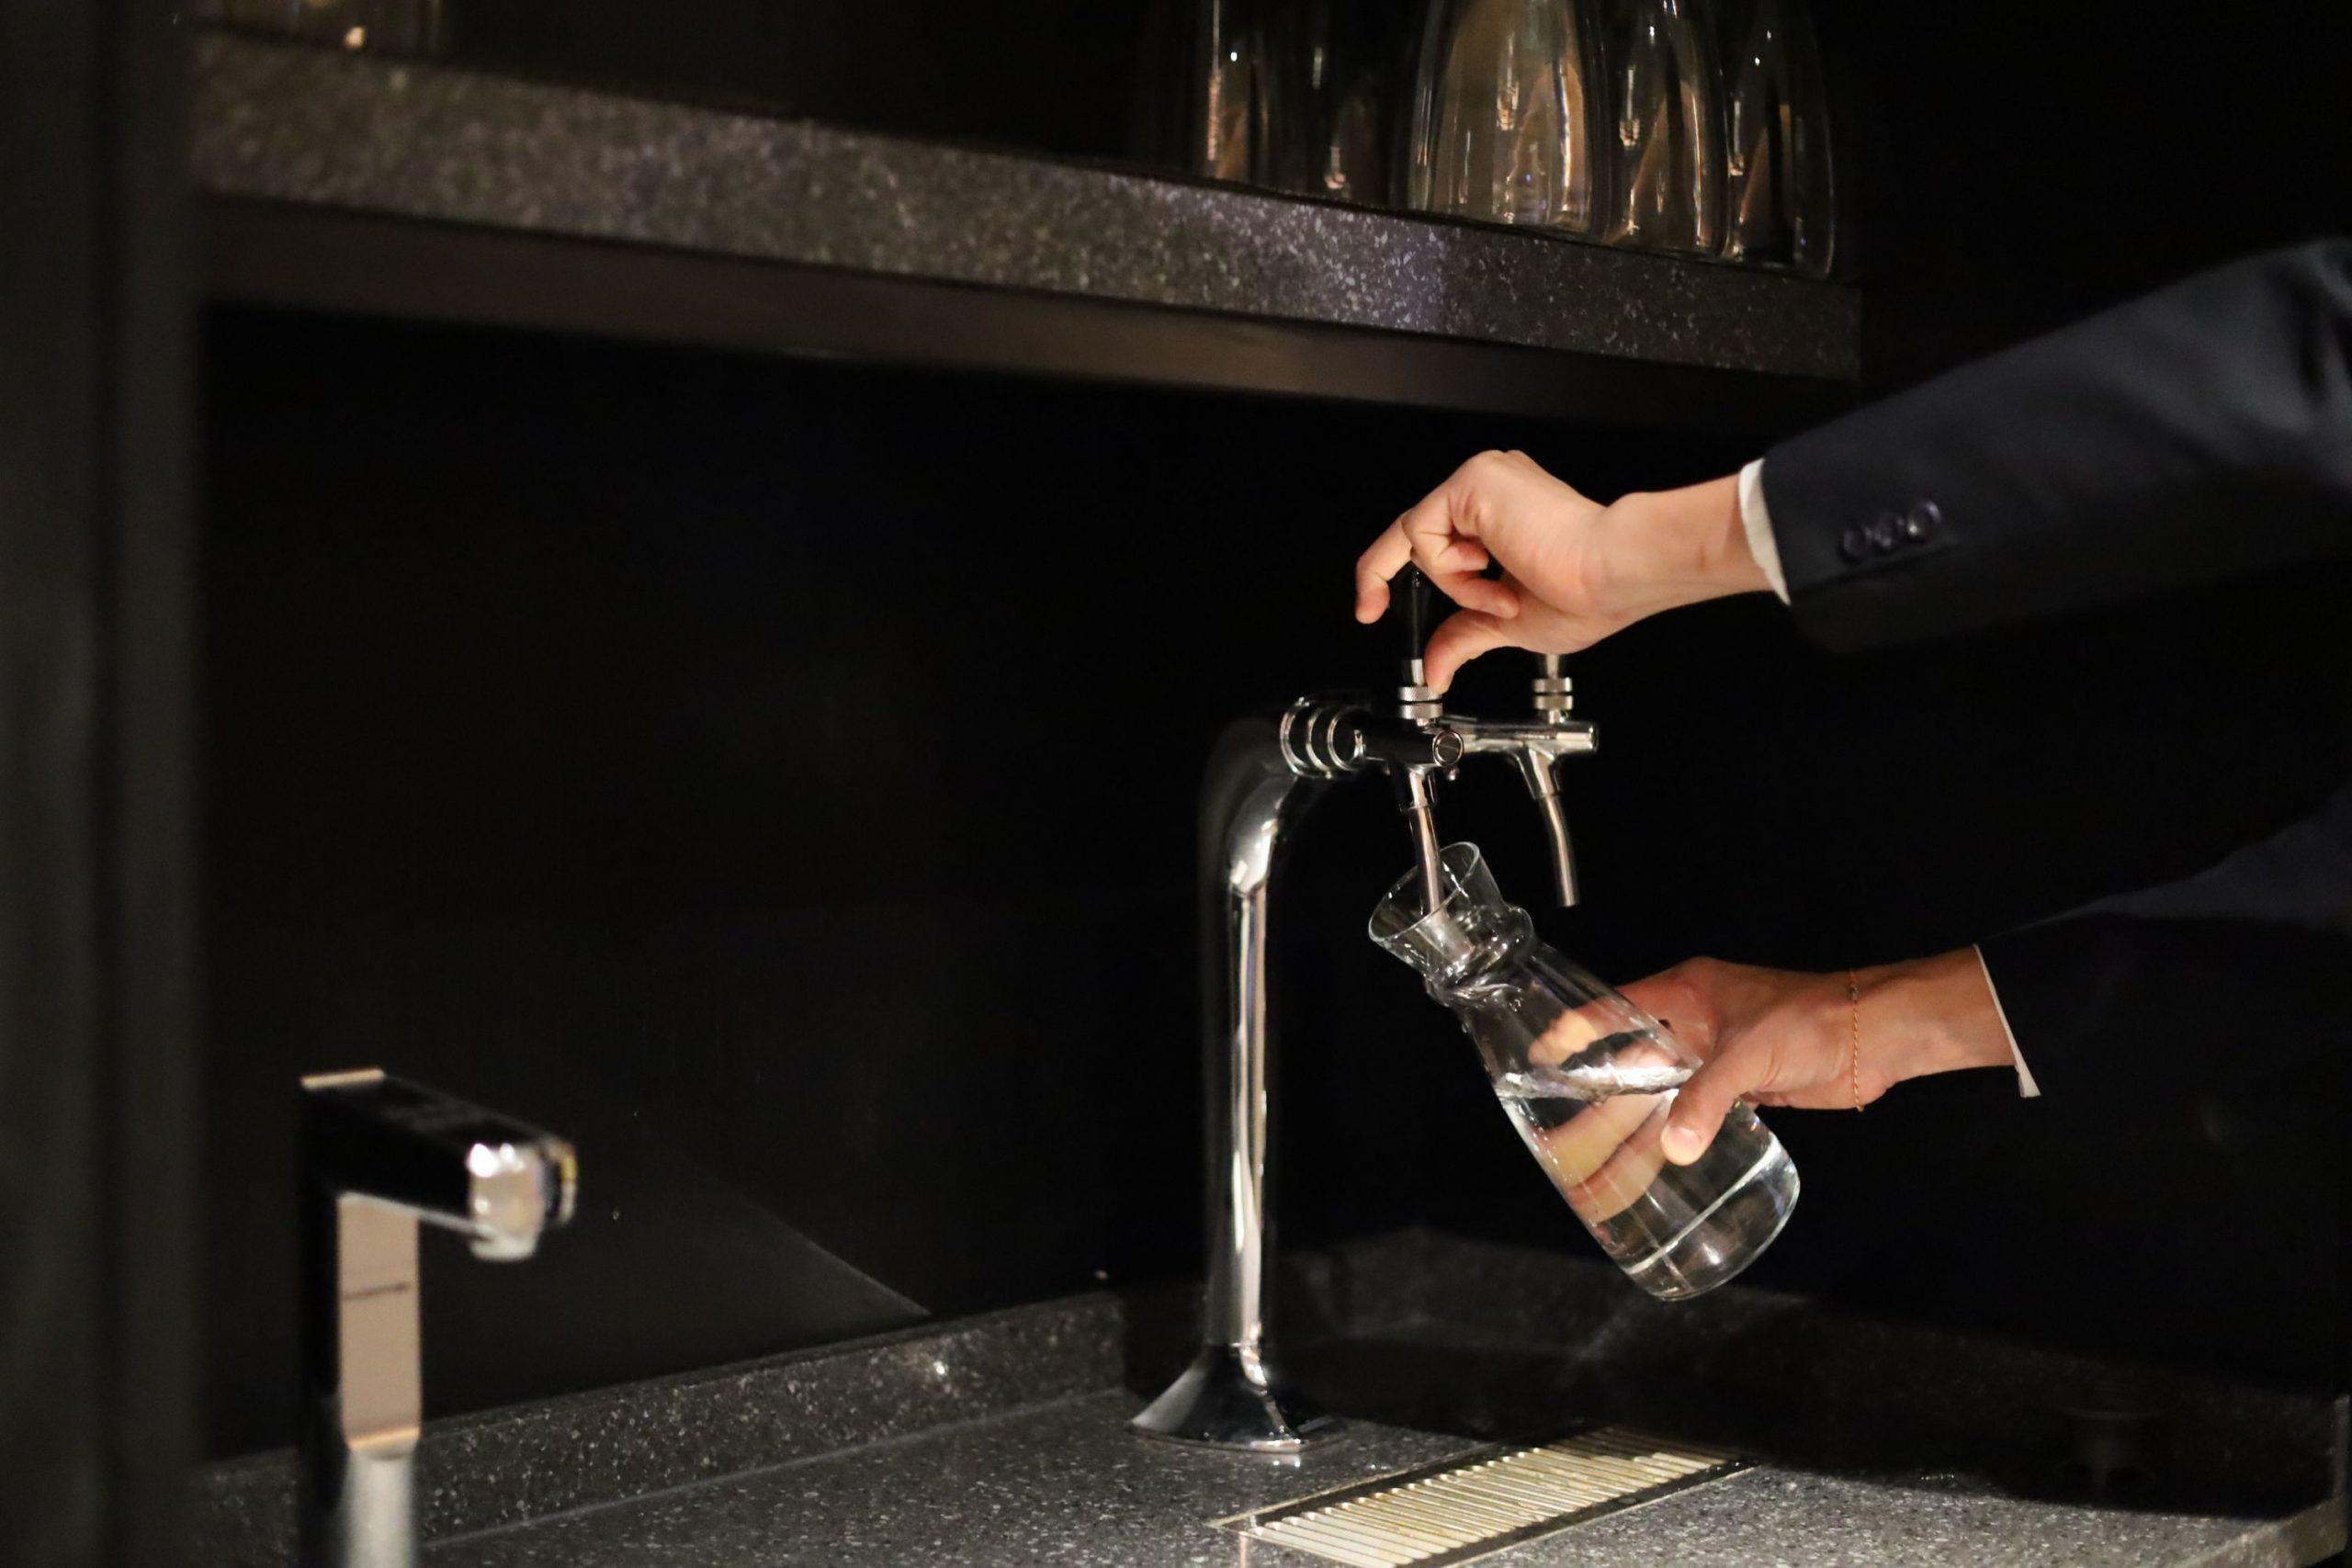 SwissPro Water Filter